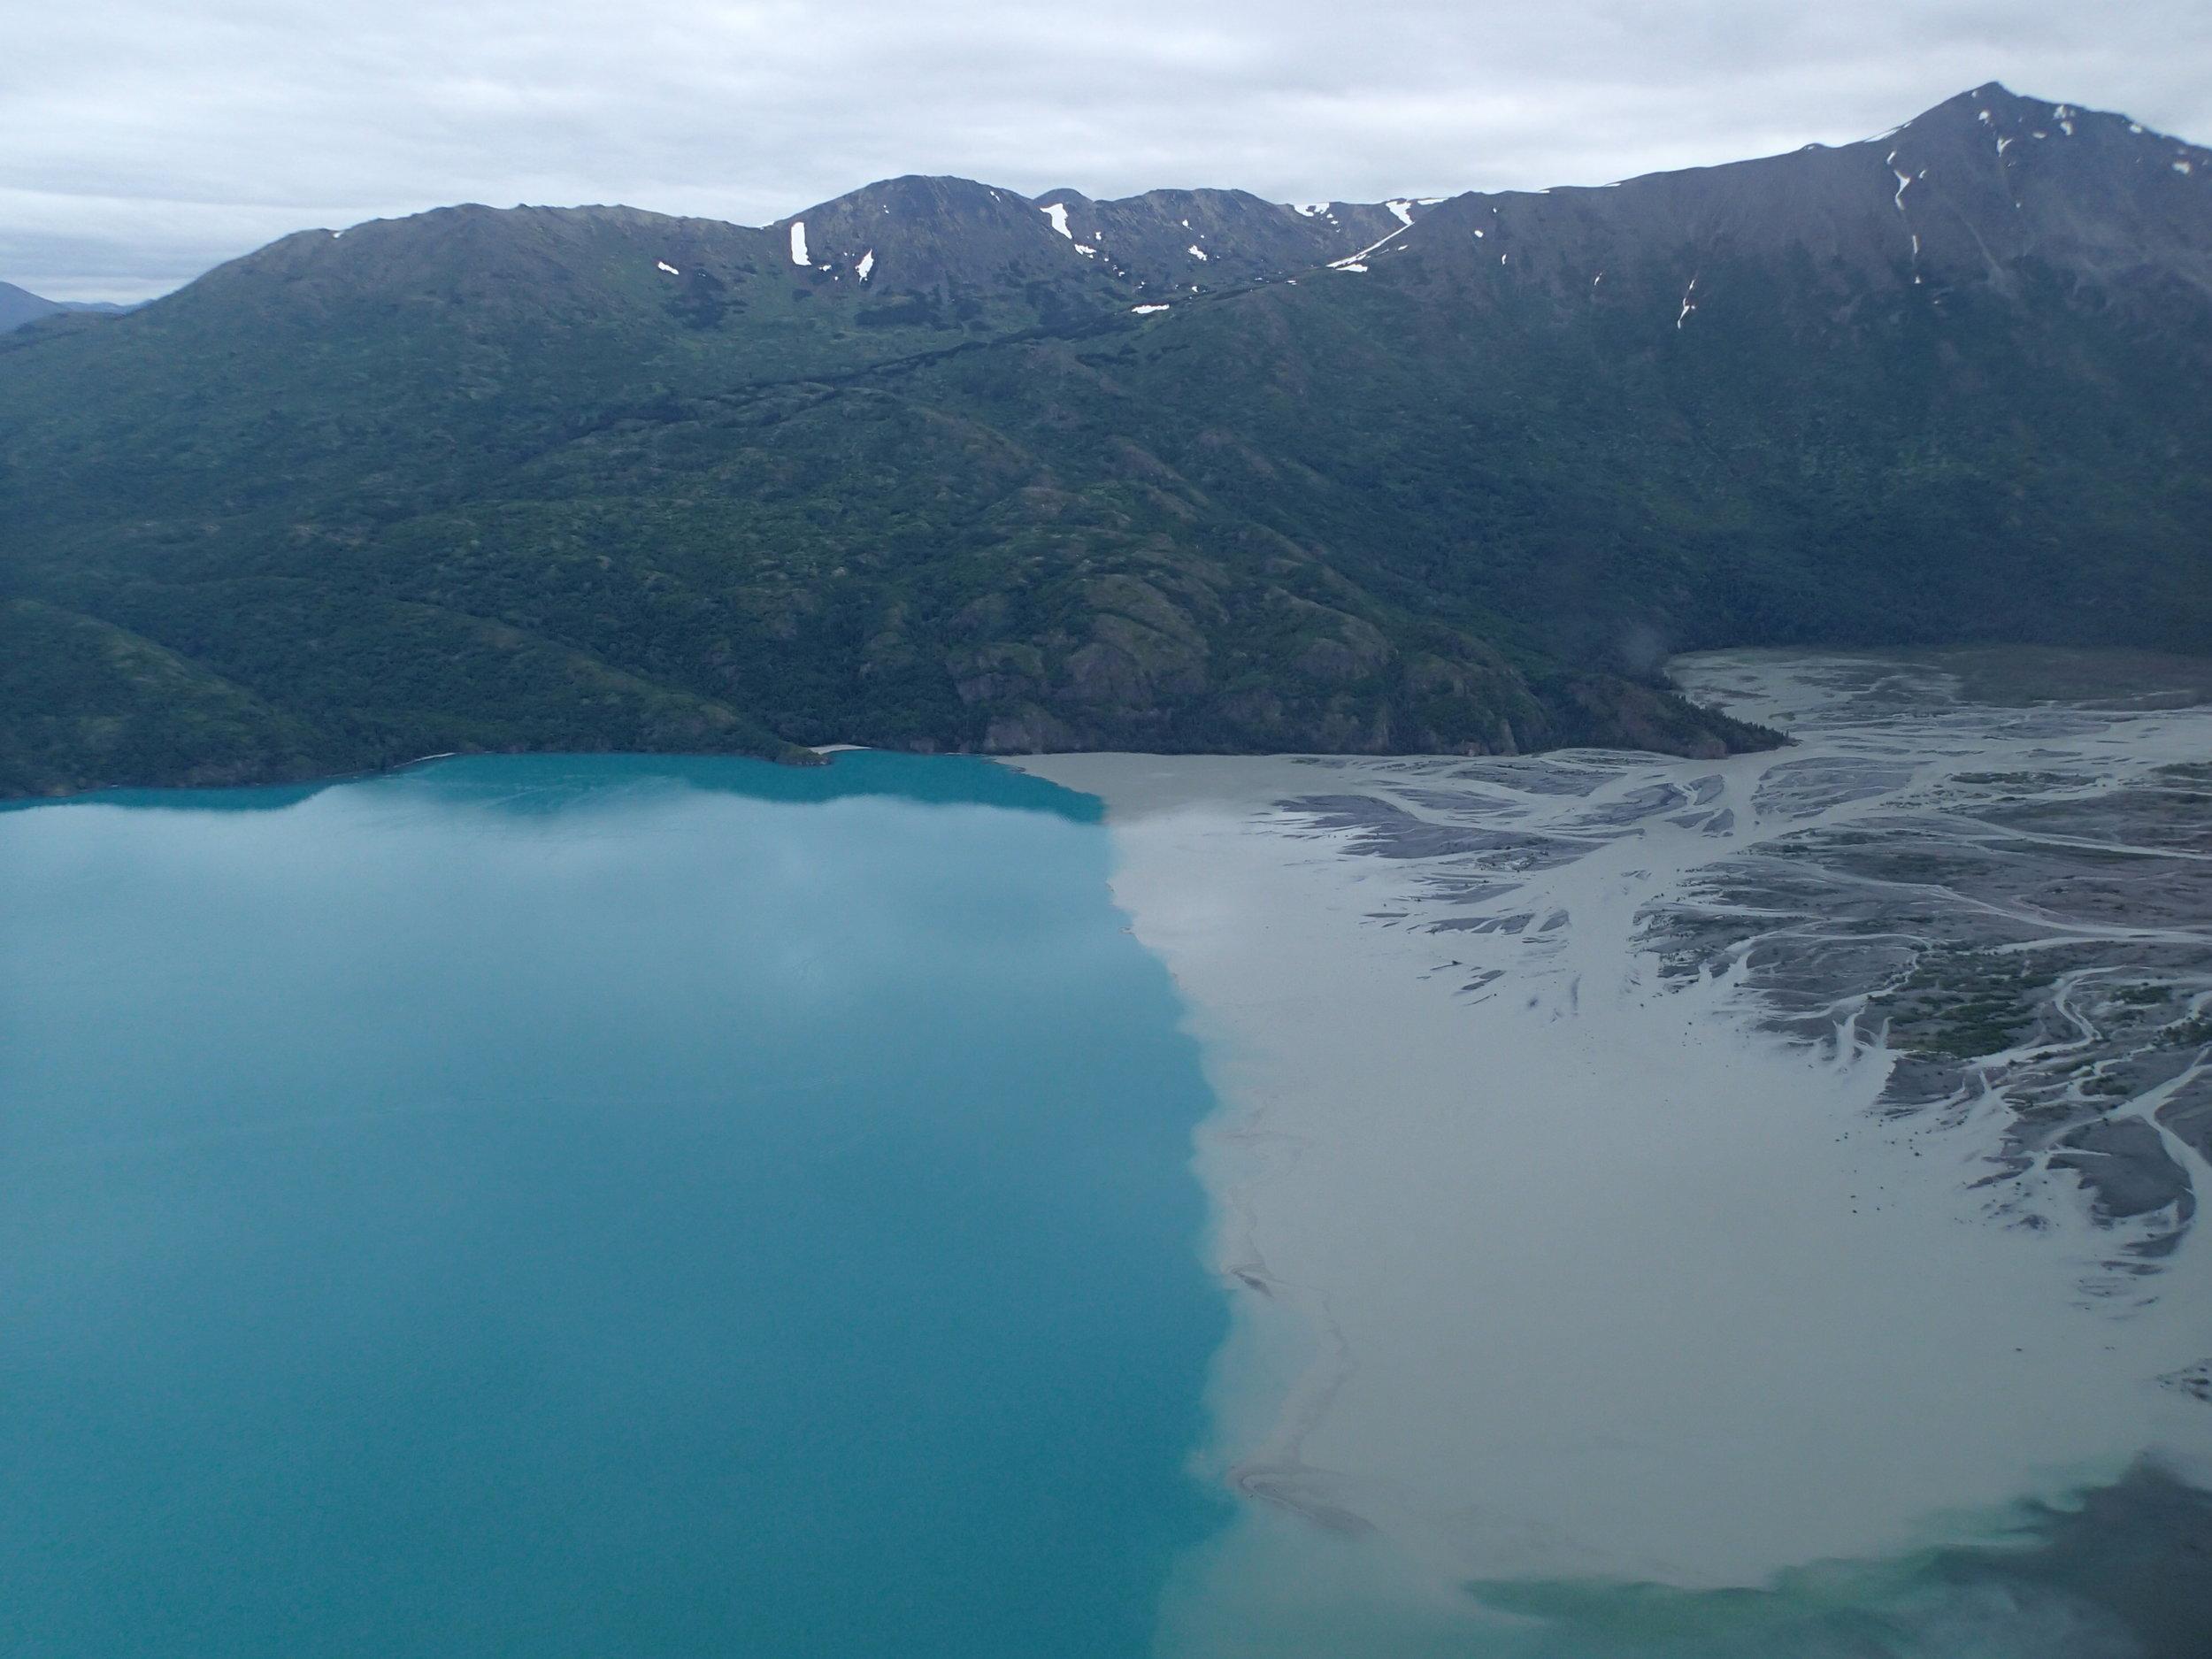 Fine sediments entering Skilak Lake from Skilak River